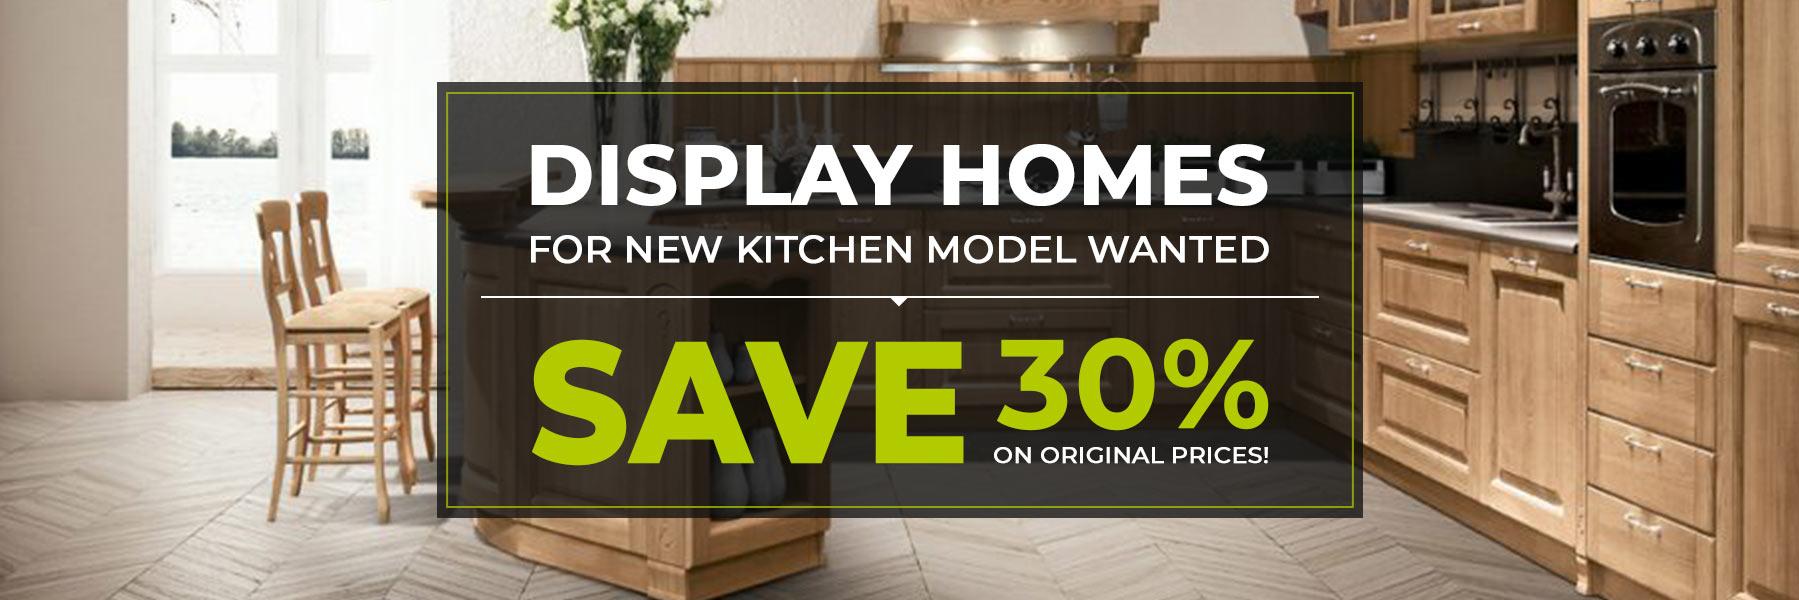 Display Kitchens Wanted Sydney - Eurolife